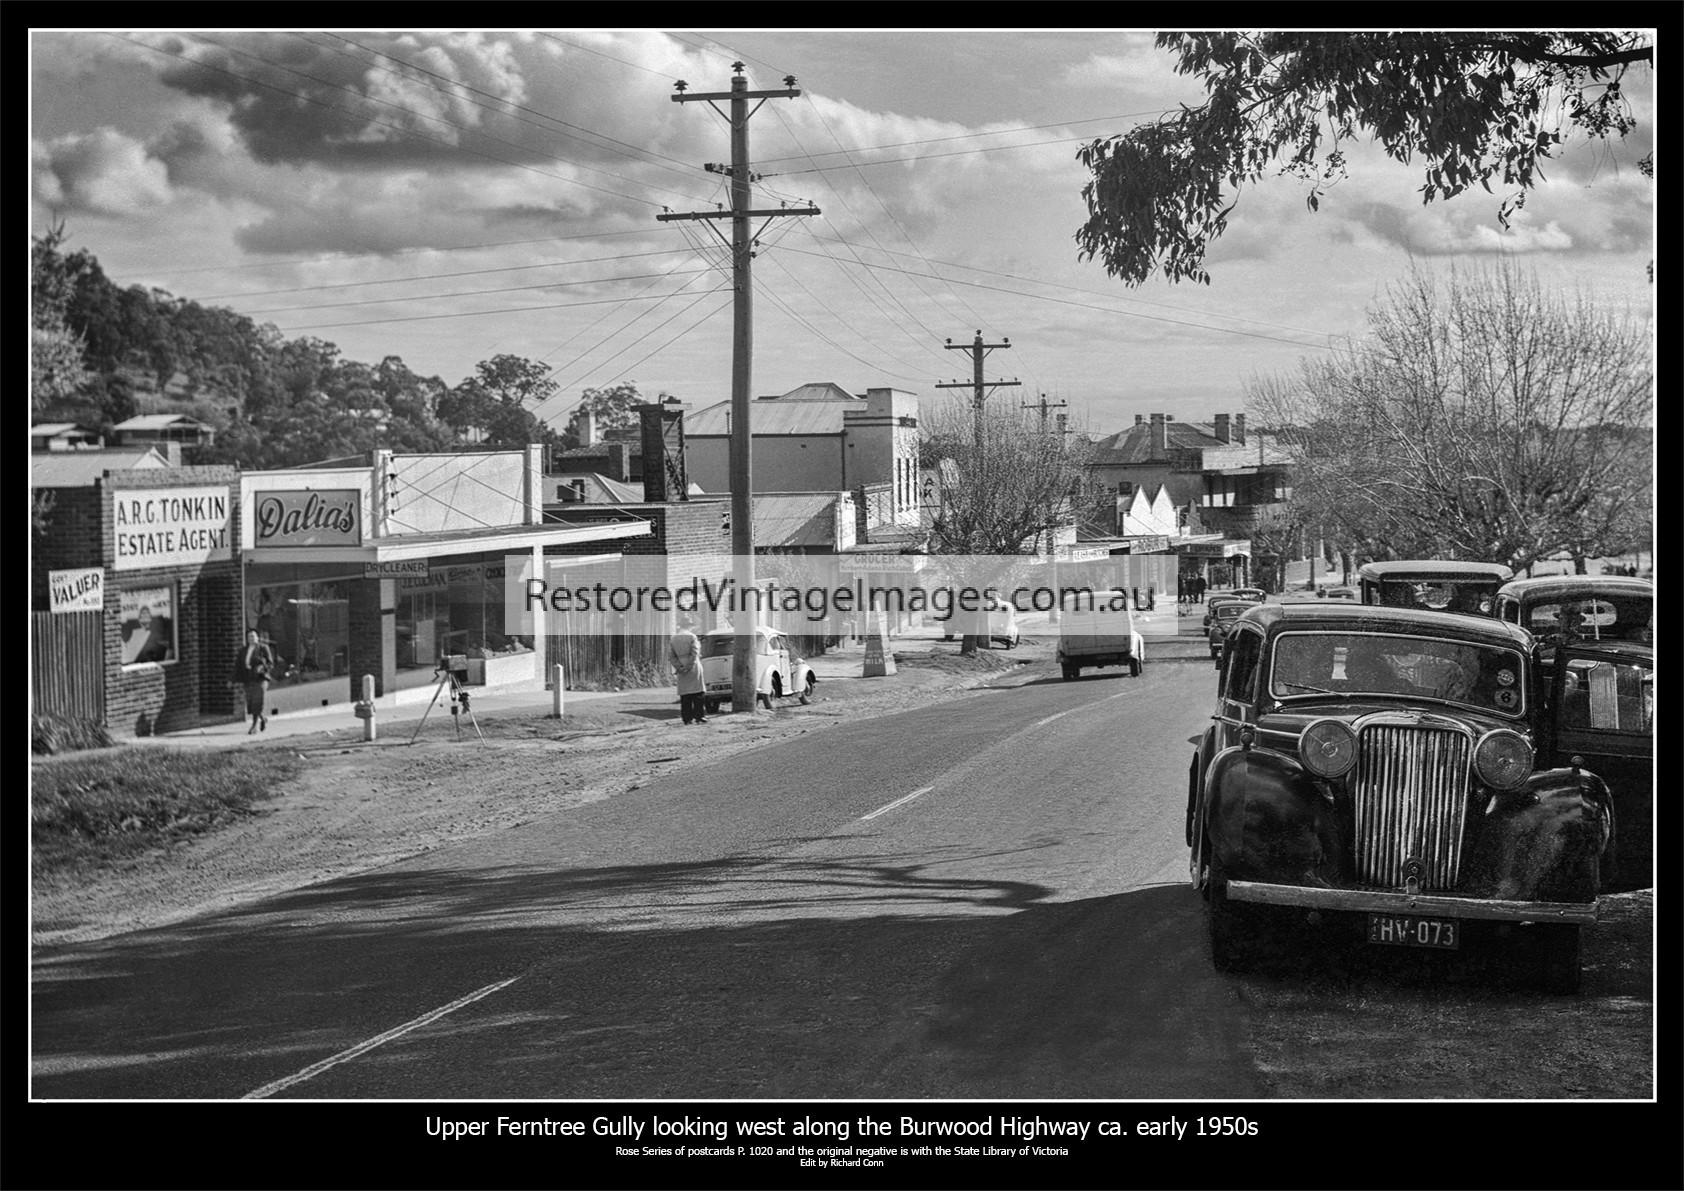 Upper Ferntree Gully, Looking West Along Main Road (Burwood Highway) Ca. 1950